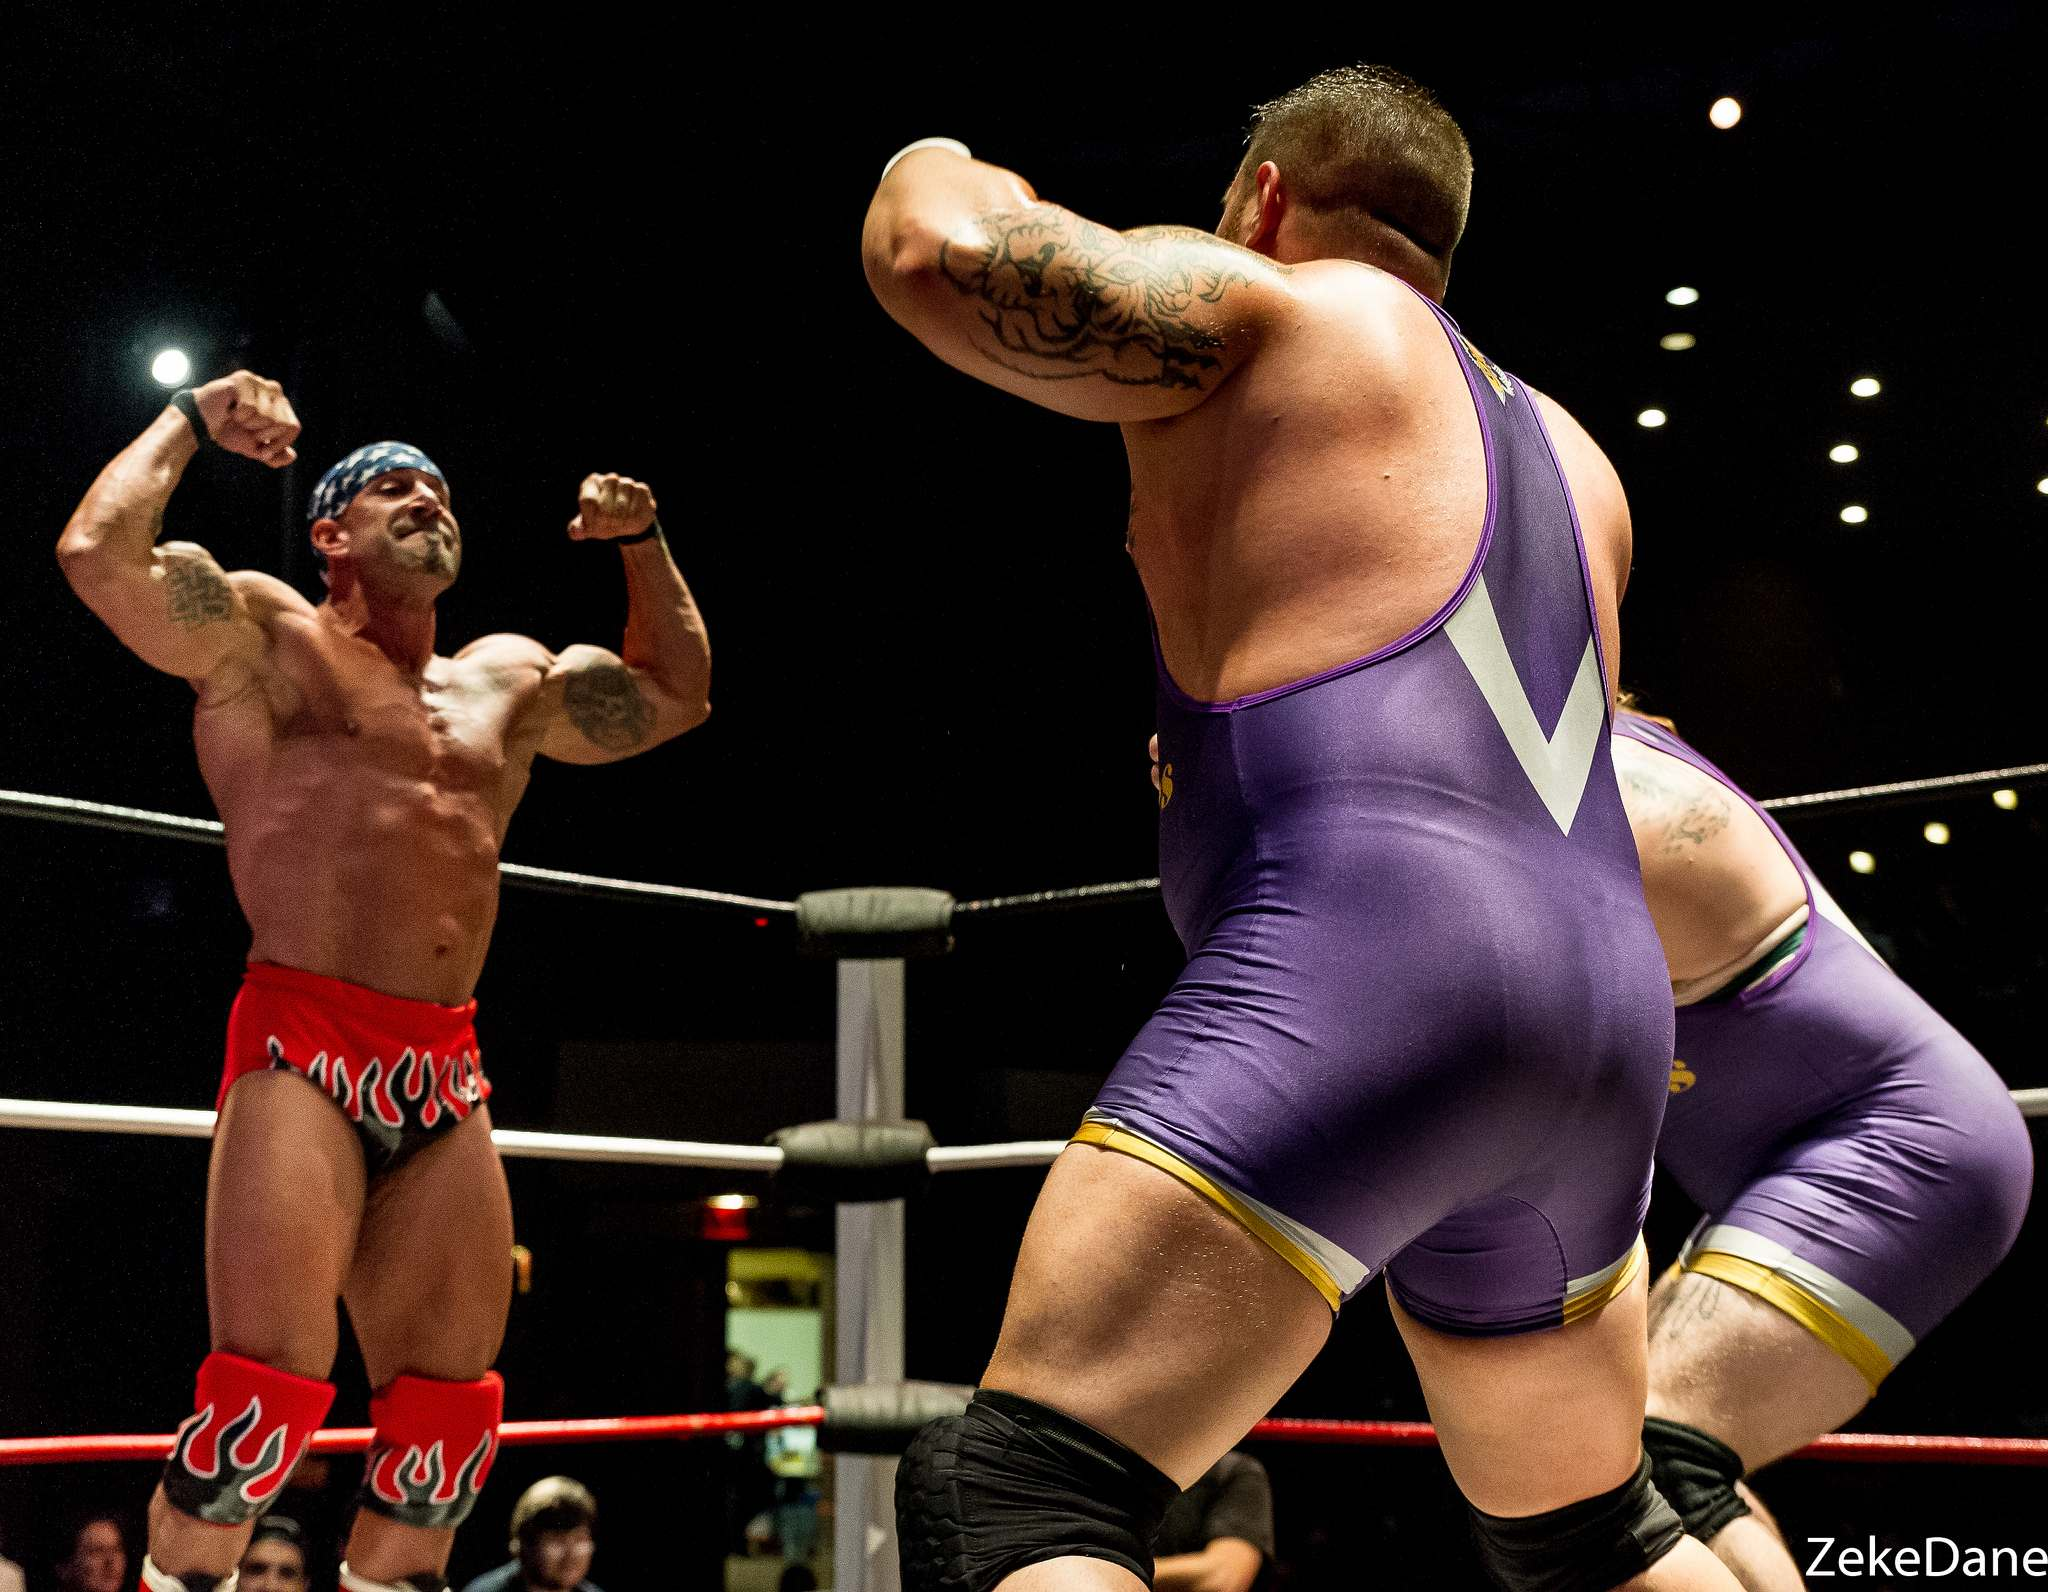 pro wrestling9 Pro Wrestling in New England 2016